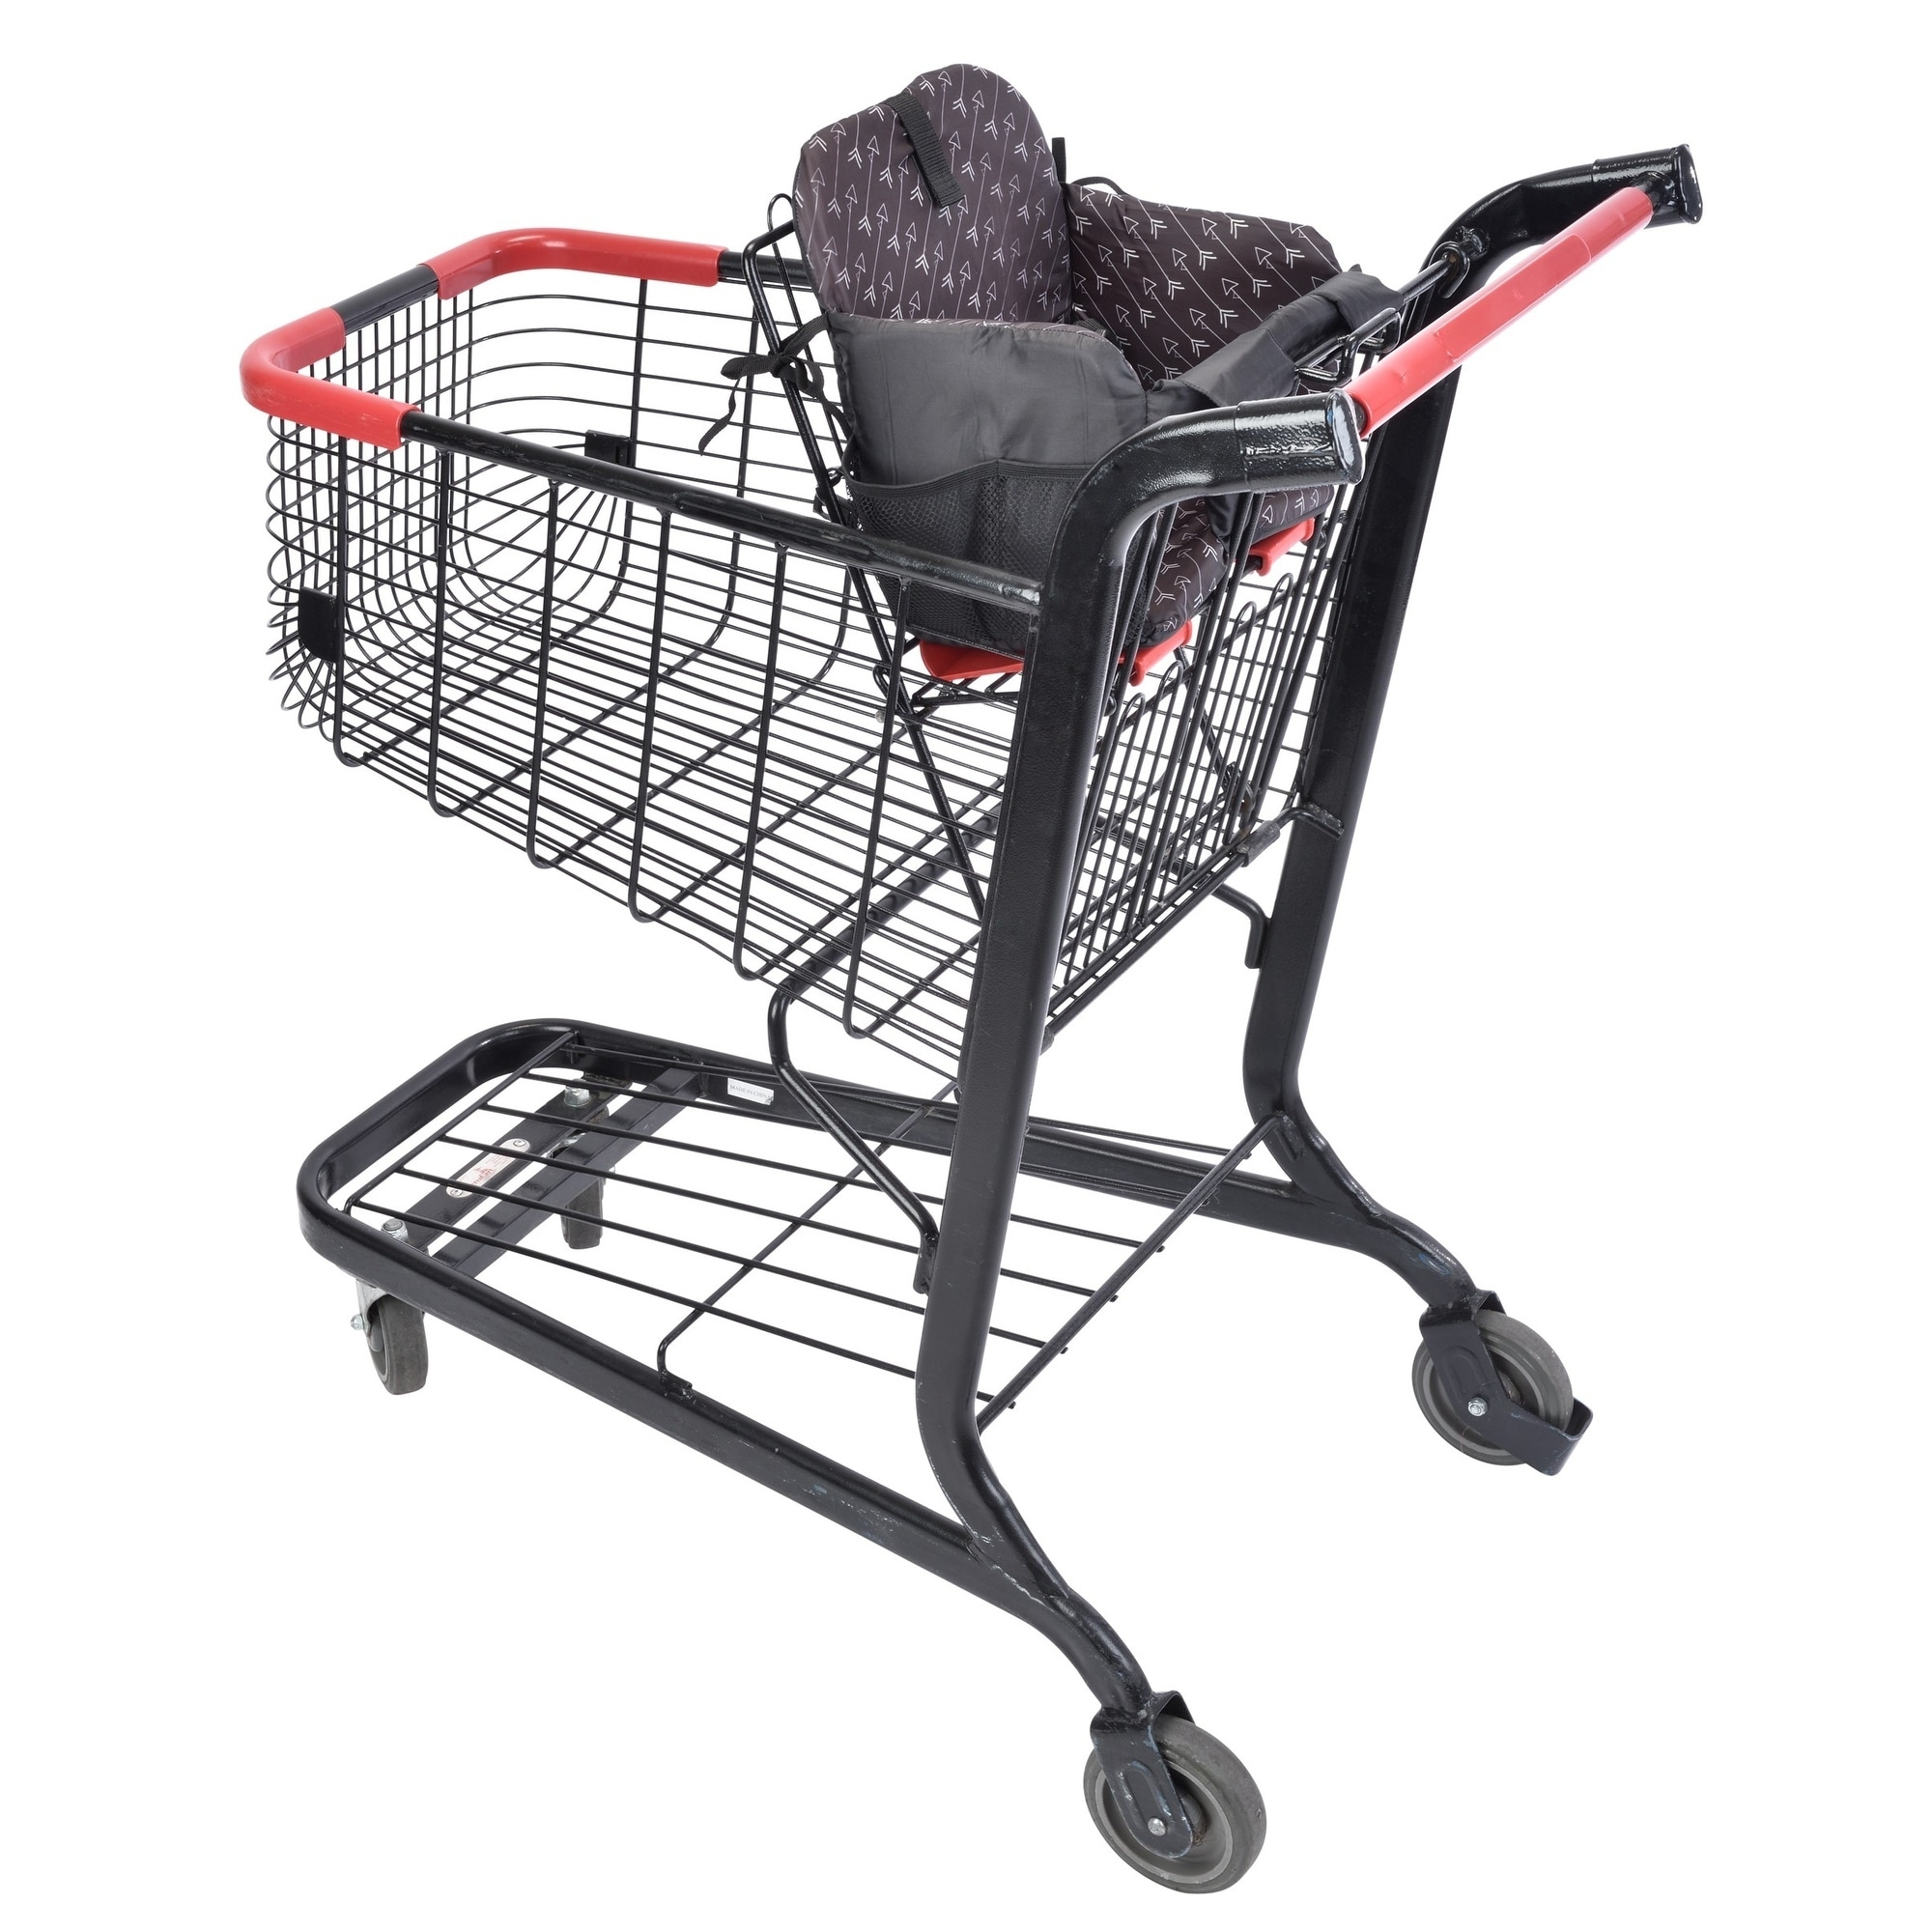 Groovy 4 24 Months Universal Fit Ziggy Momogo Baby Shopping Cart Spiritservingveterans Wood Chair Design Ideas Spiritservingveteransorg